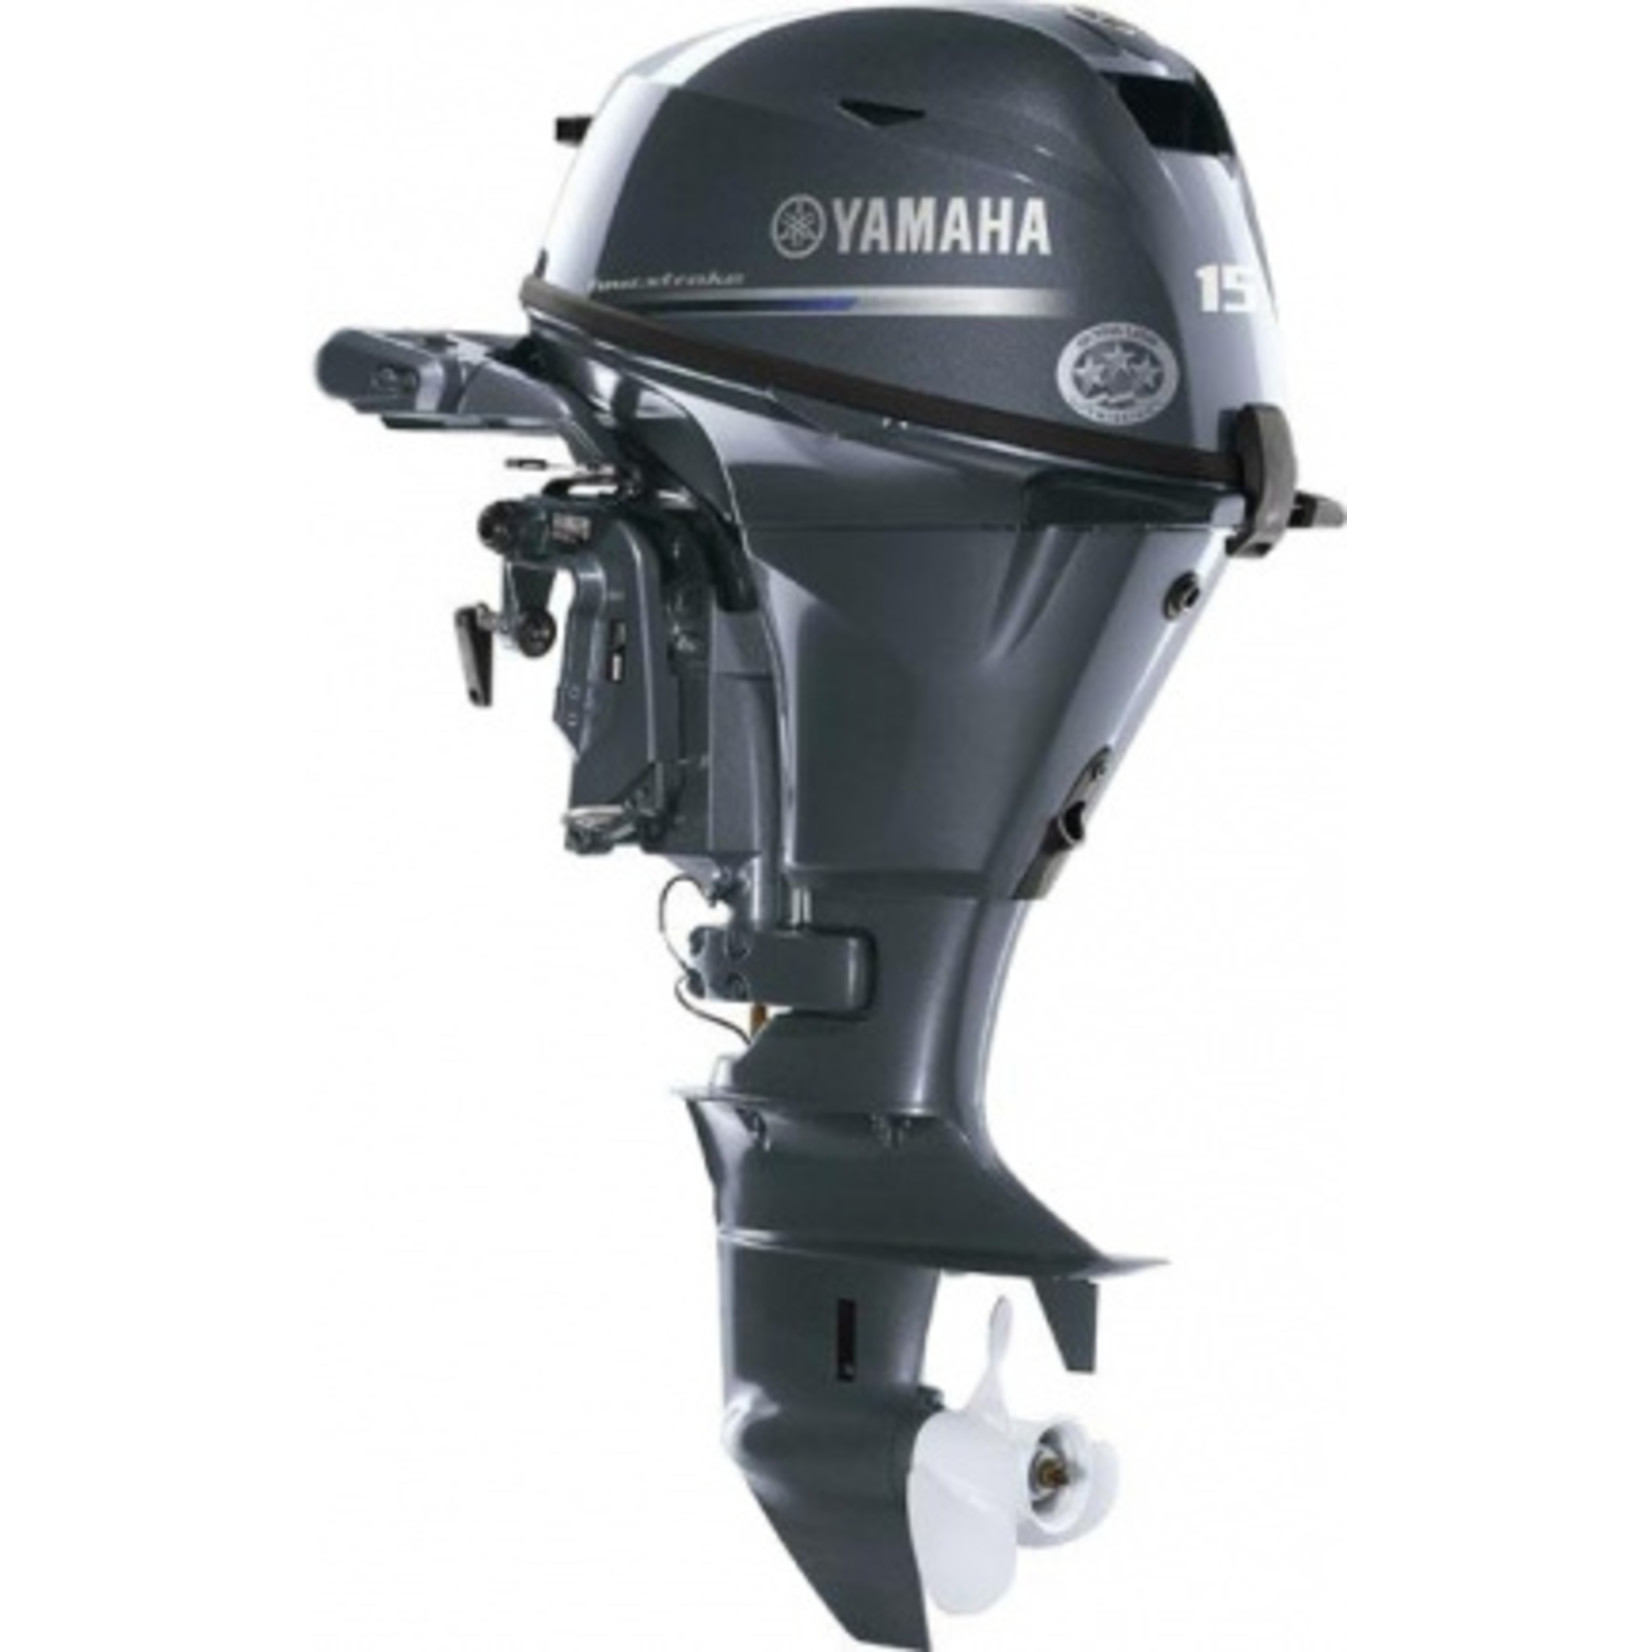 Yamaha Yamaha 15HP CES outboard engine